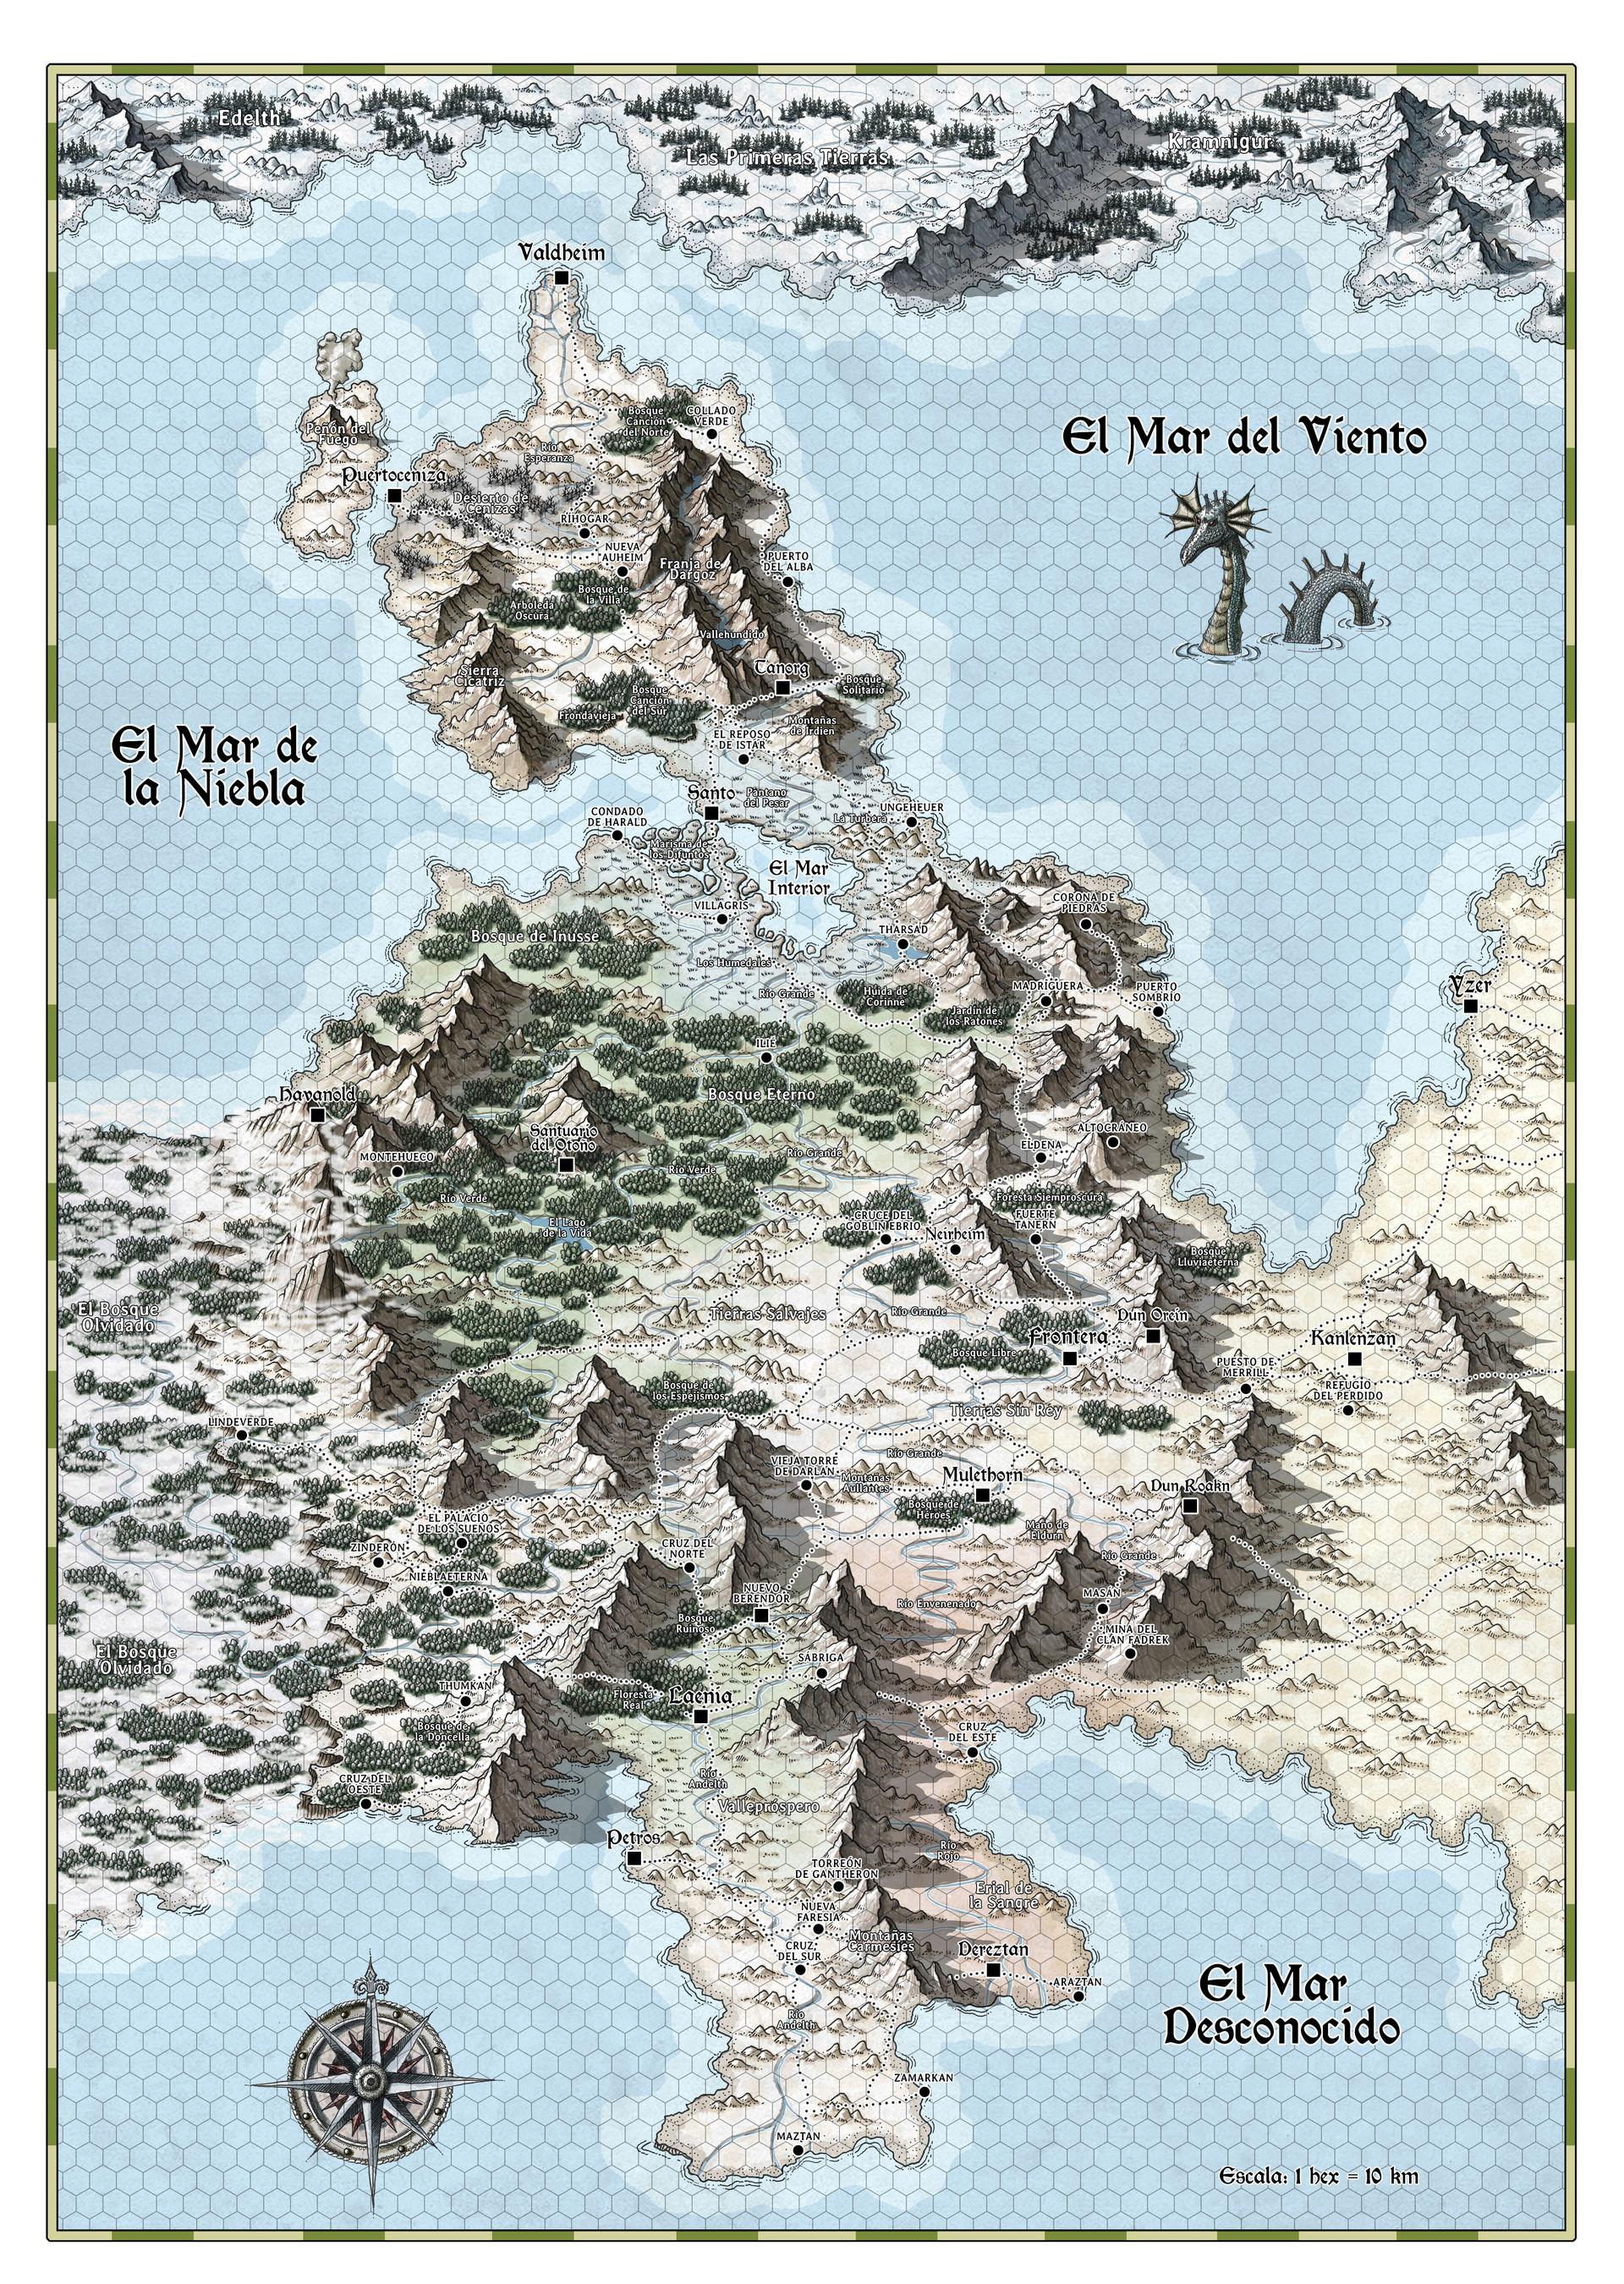 Daniel menendez mapa1flat copy